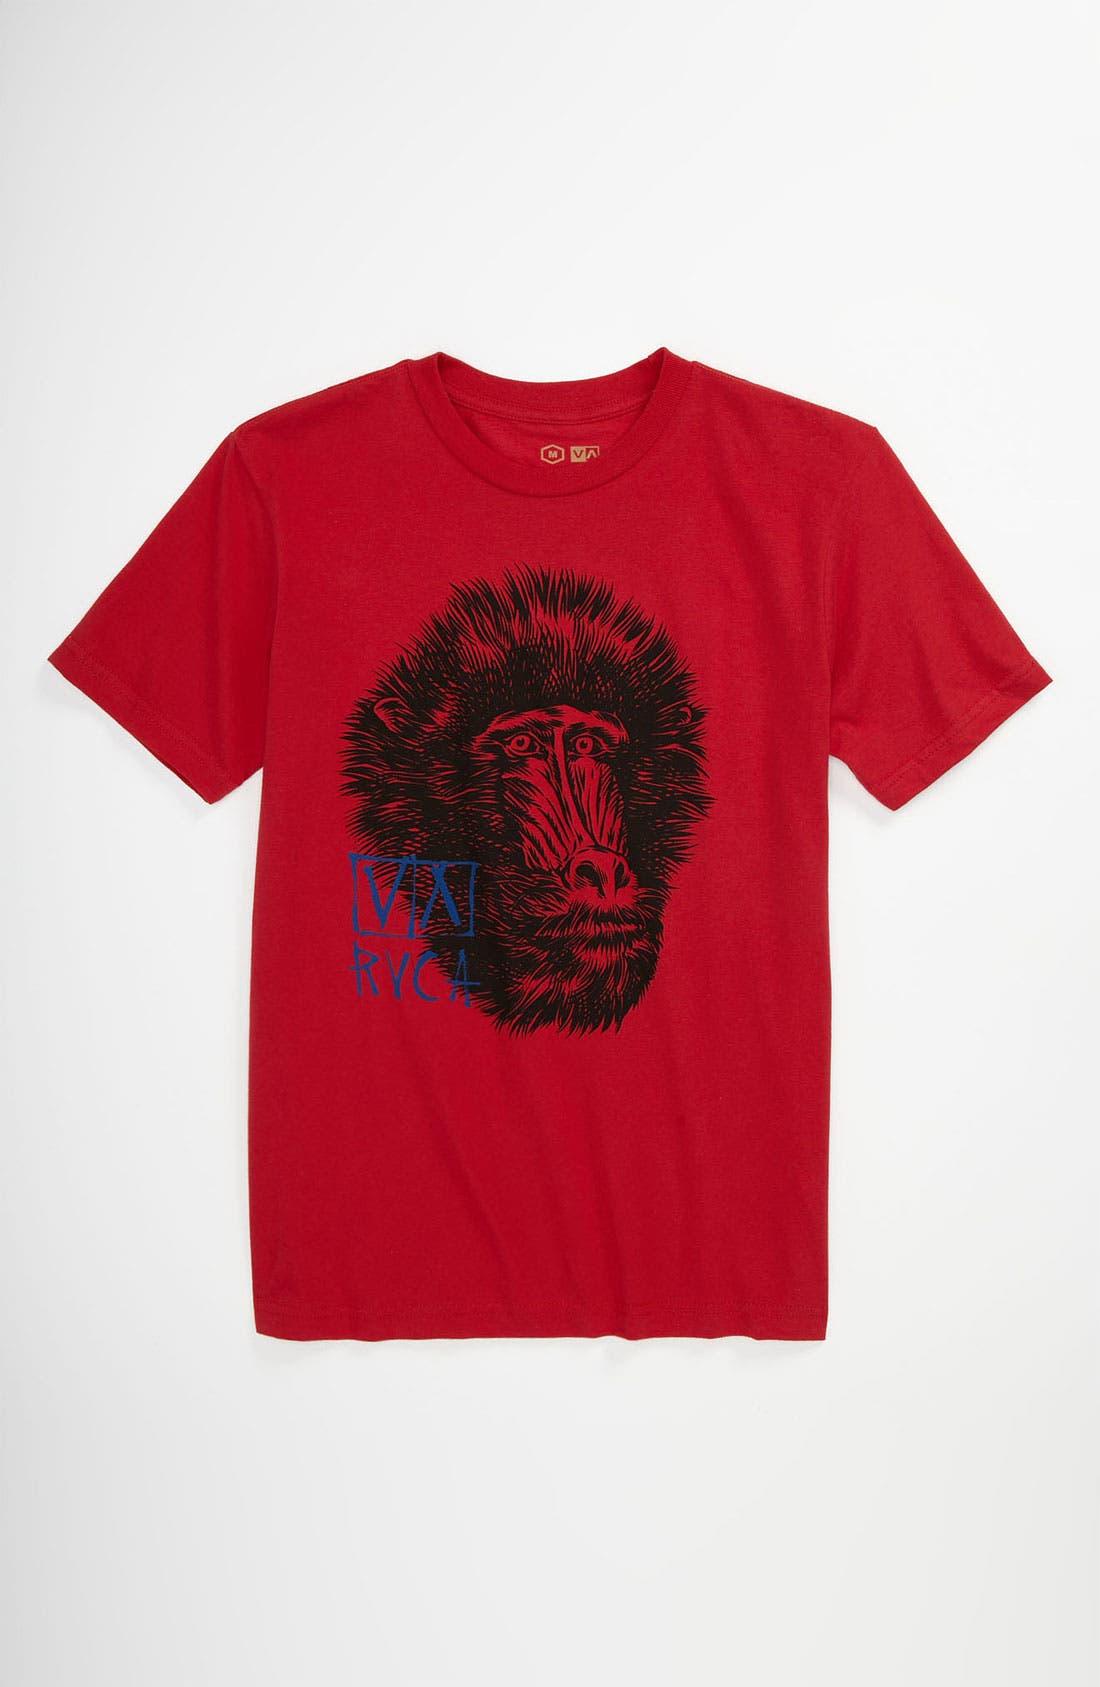 Alternate Image 1 Selected - RVCA 'Mandrill' T-Shirt (Big Boys)